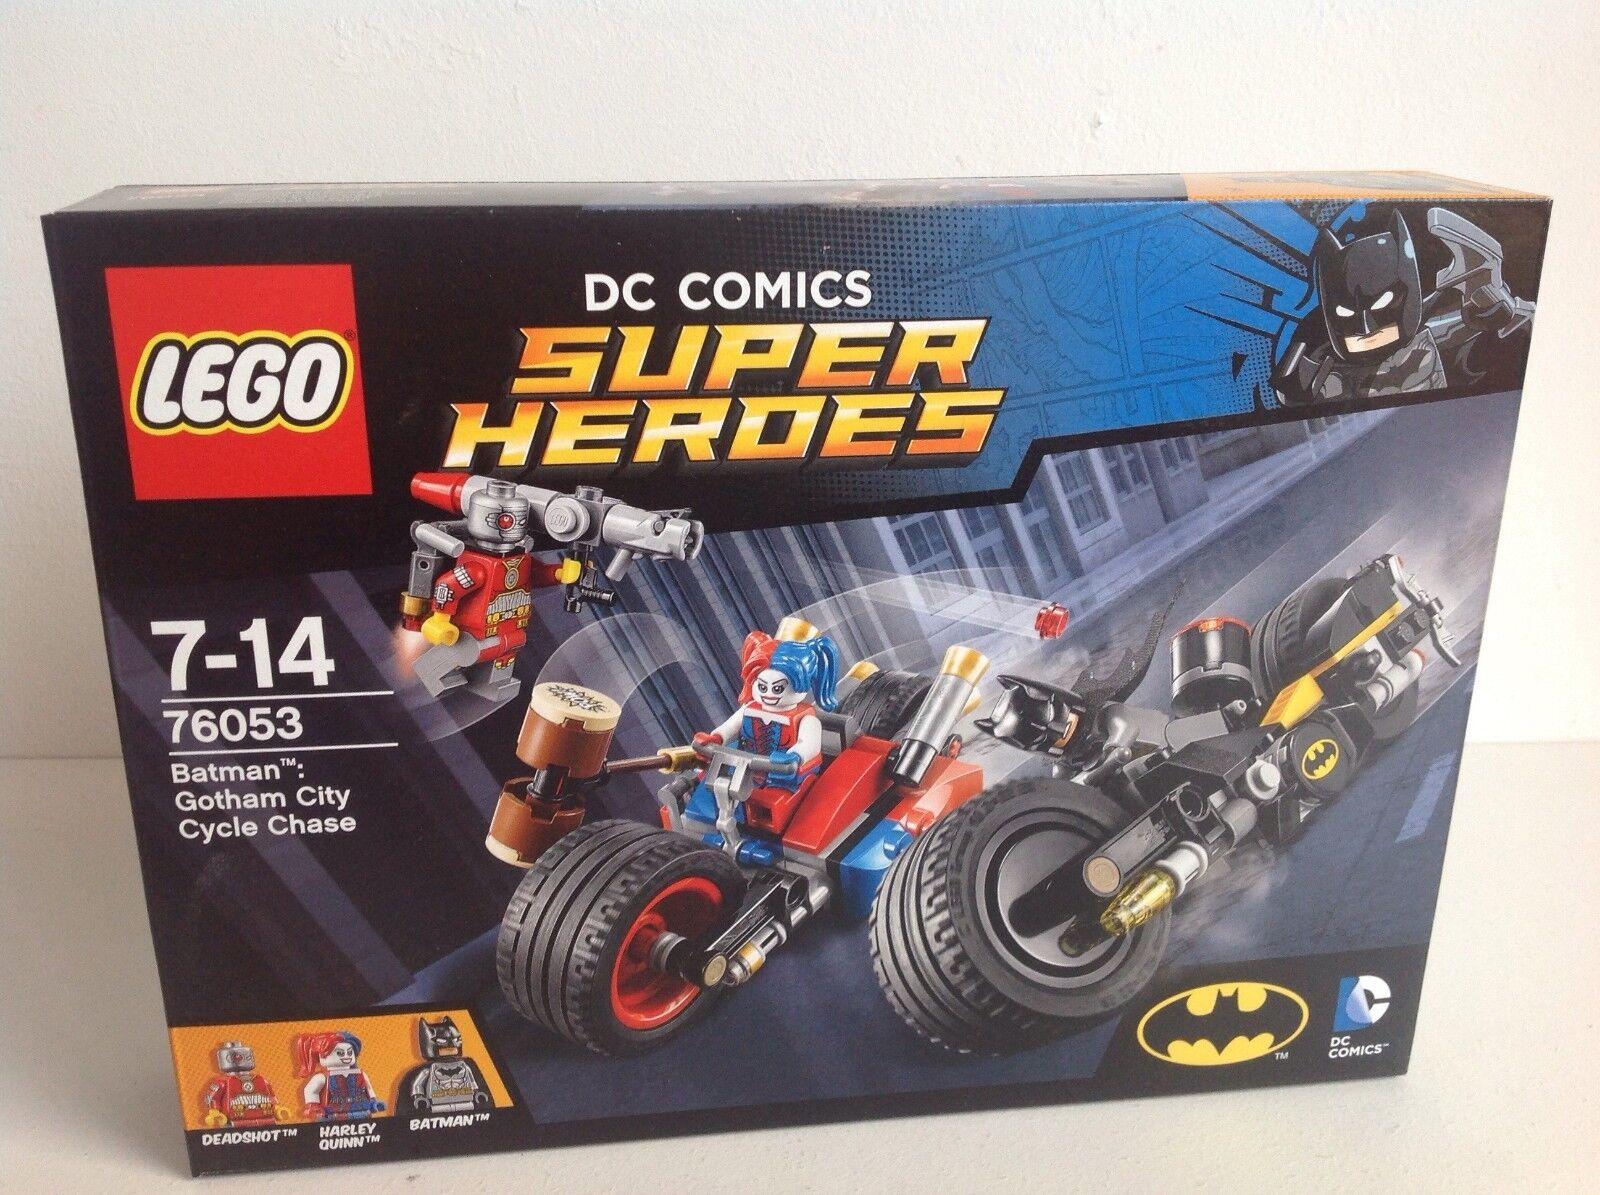 LEGO Super Heroes 76053 Batman Gotham City Cycle Chase with 3 Mini Figures.